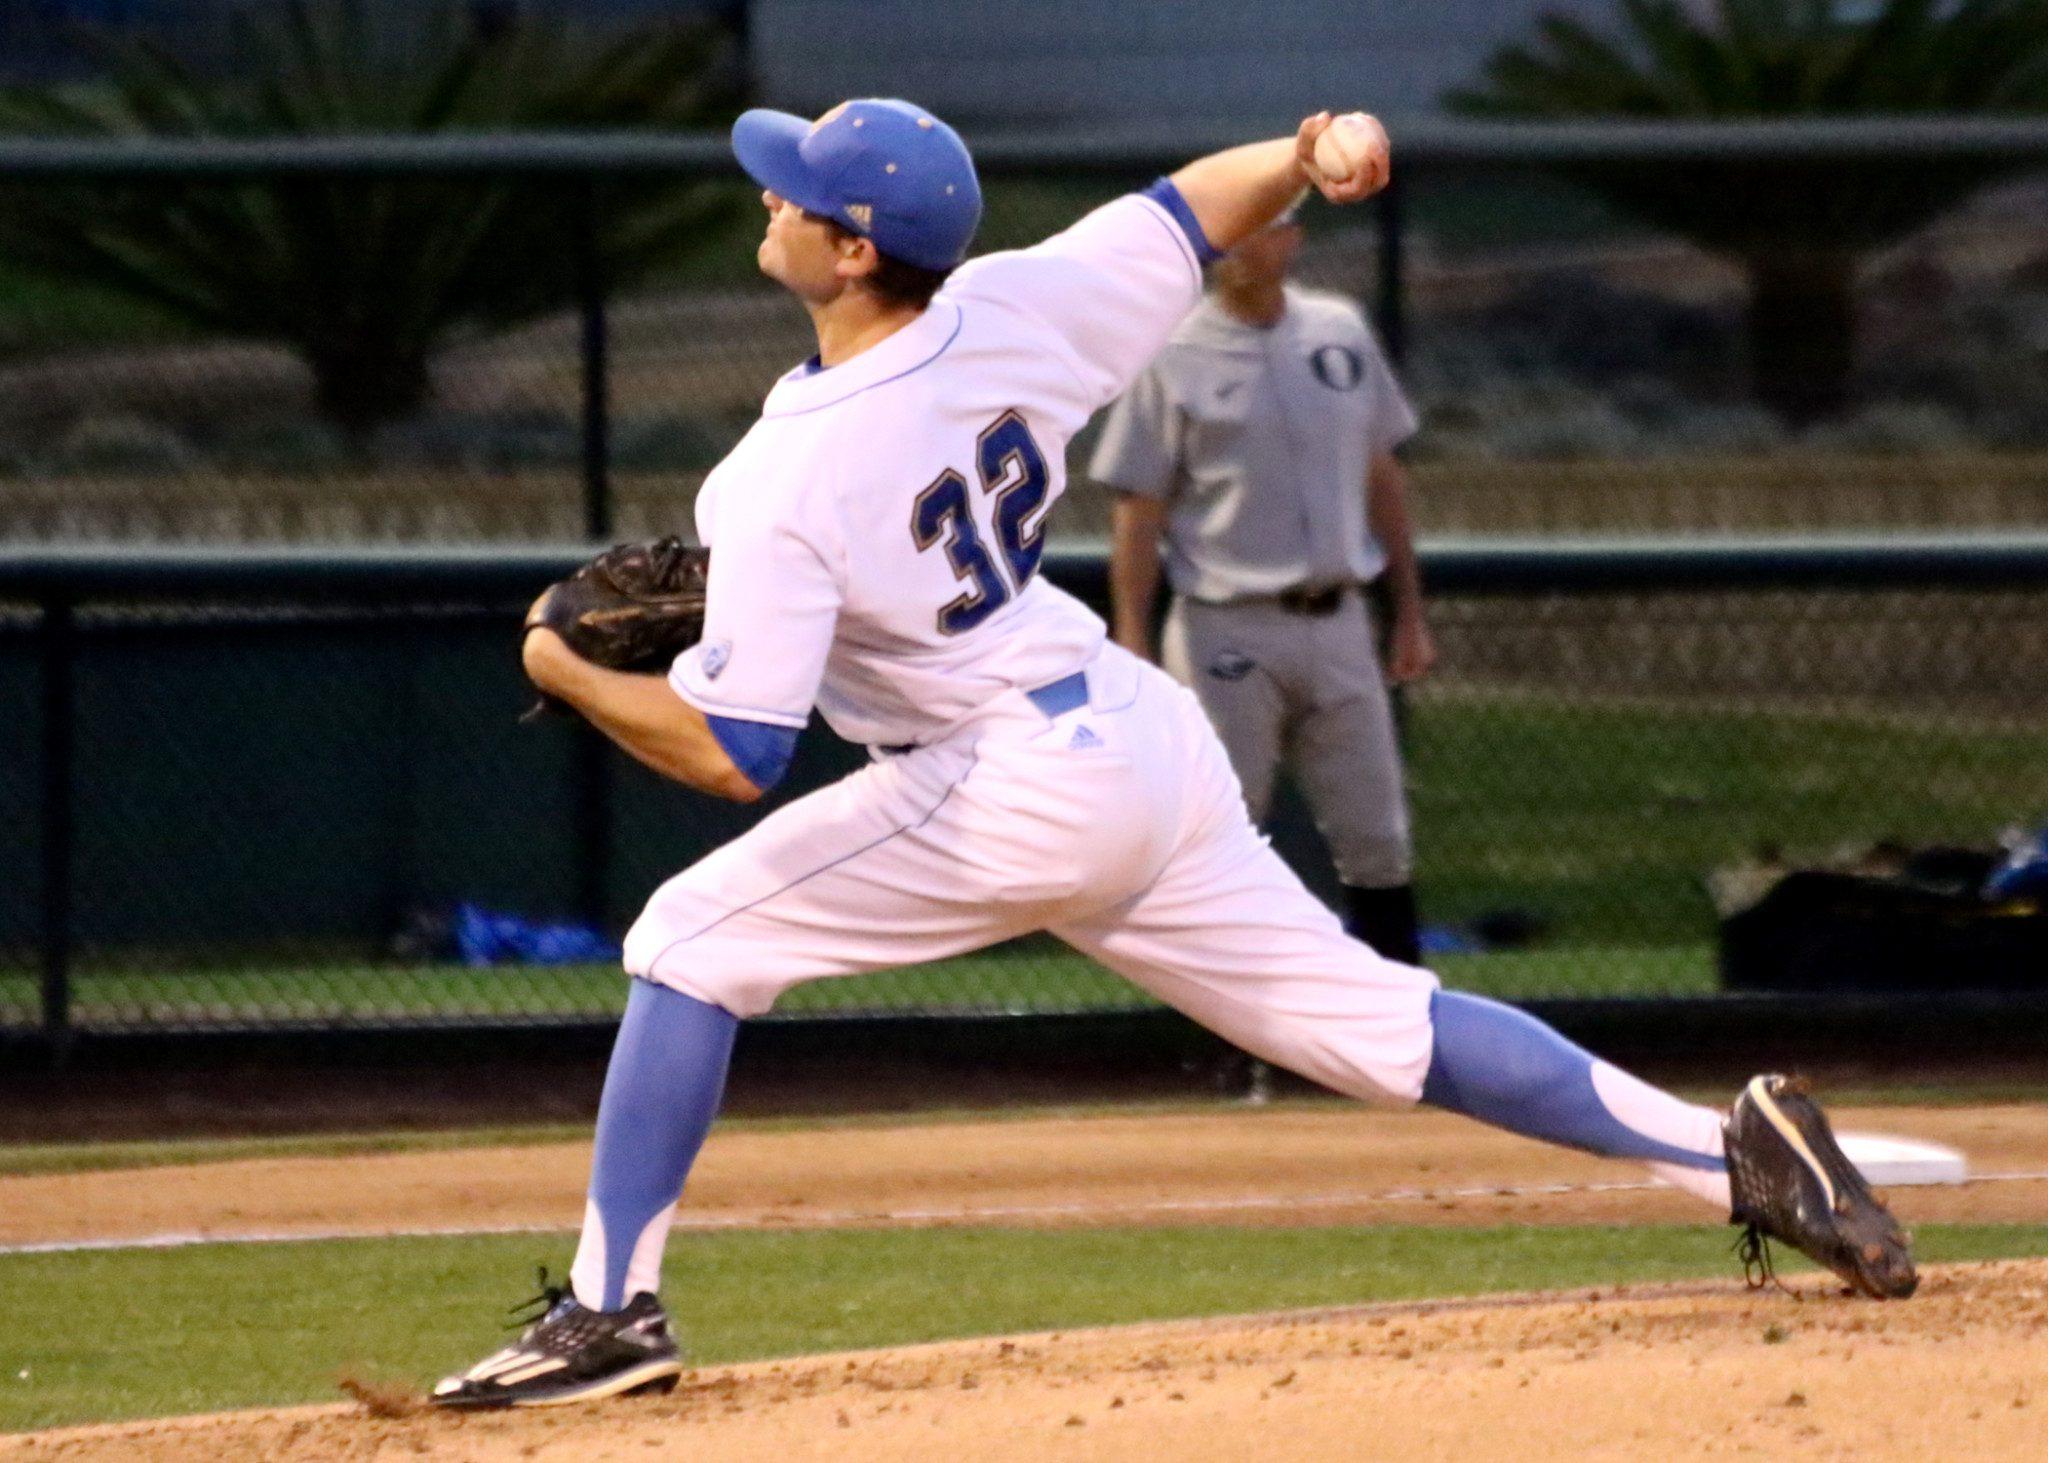 Grant Dyer, UCLA